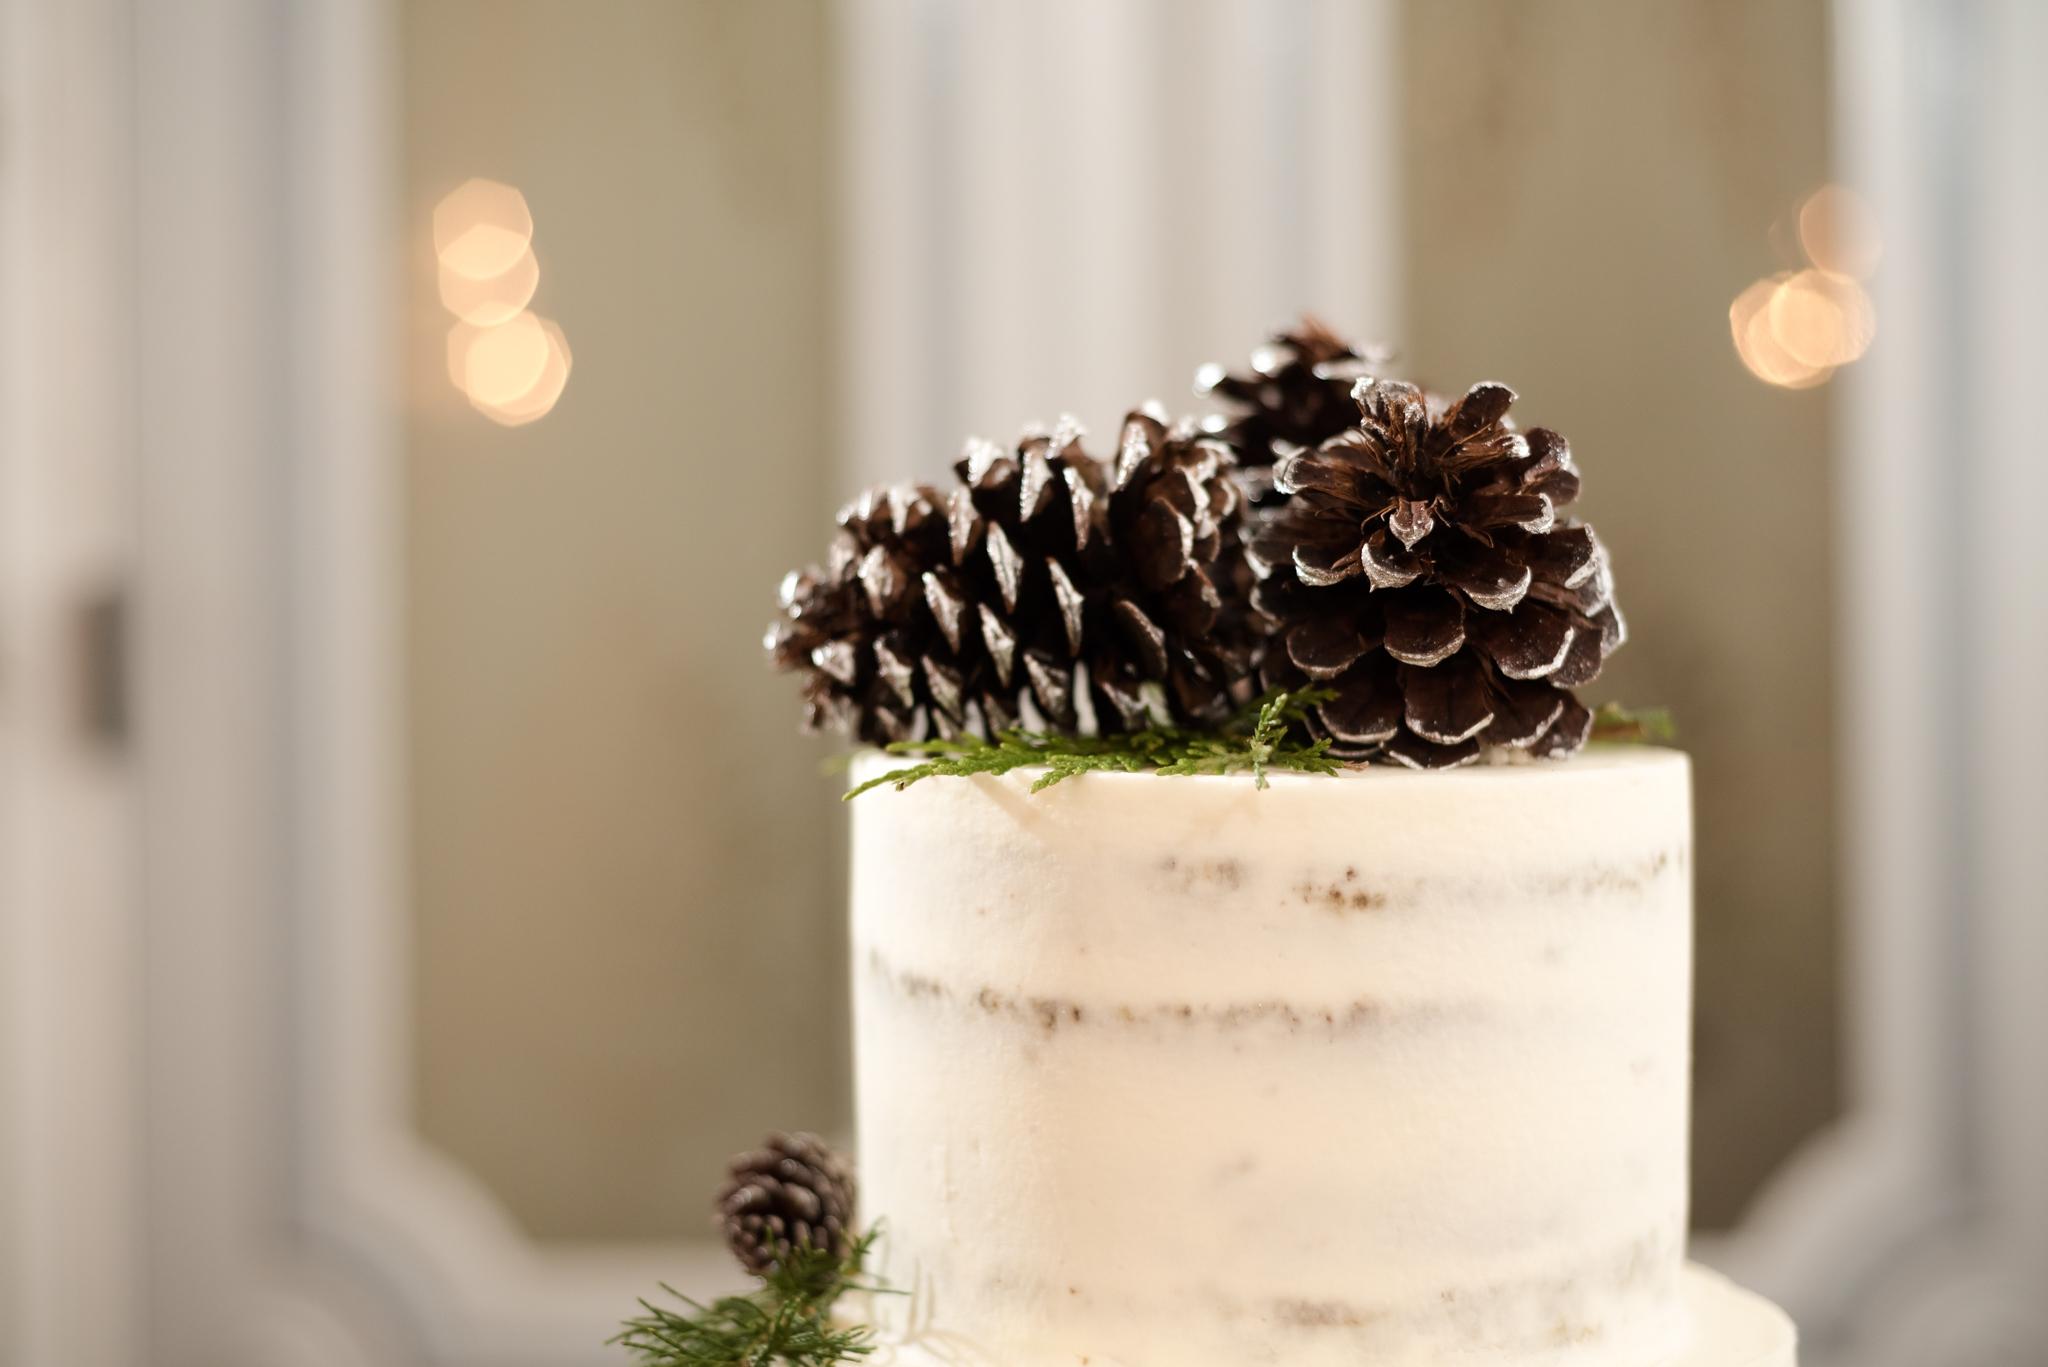 merrimon-wynne-wedding-photography-039.jpg